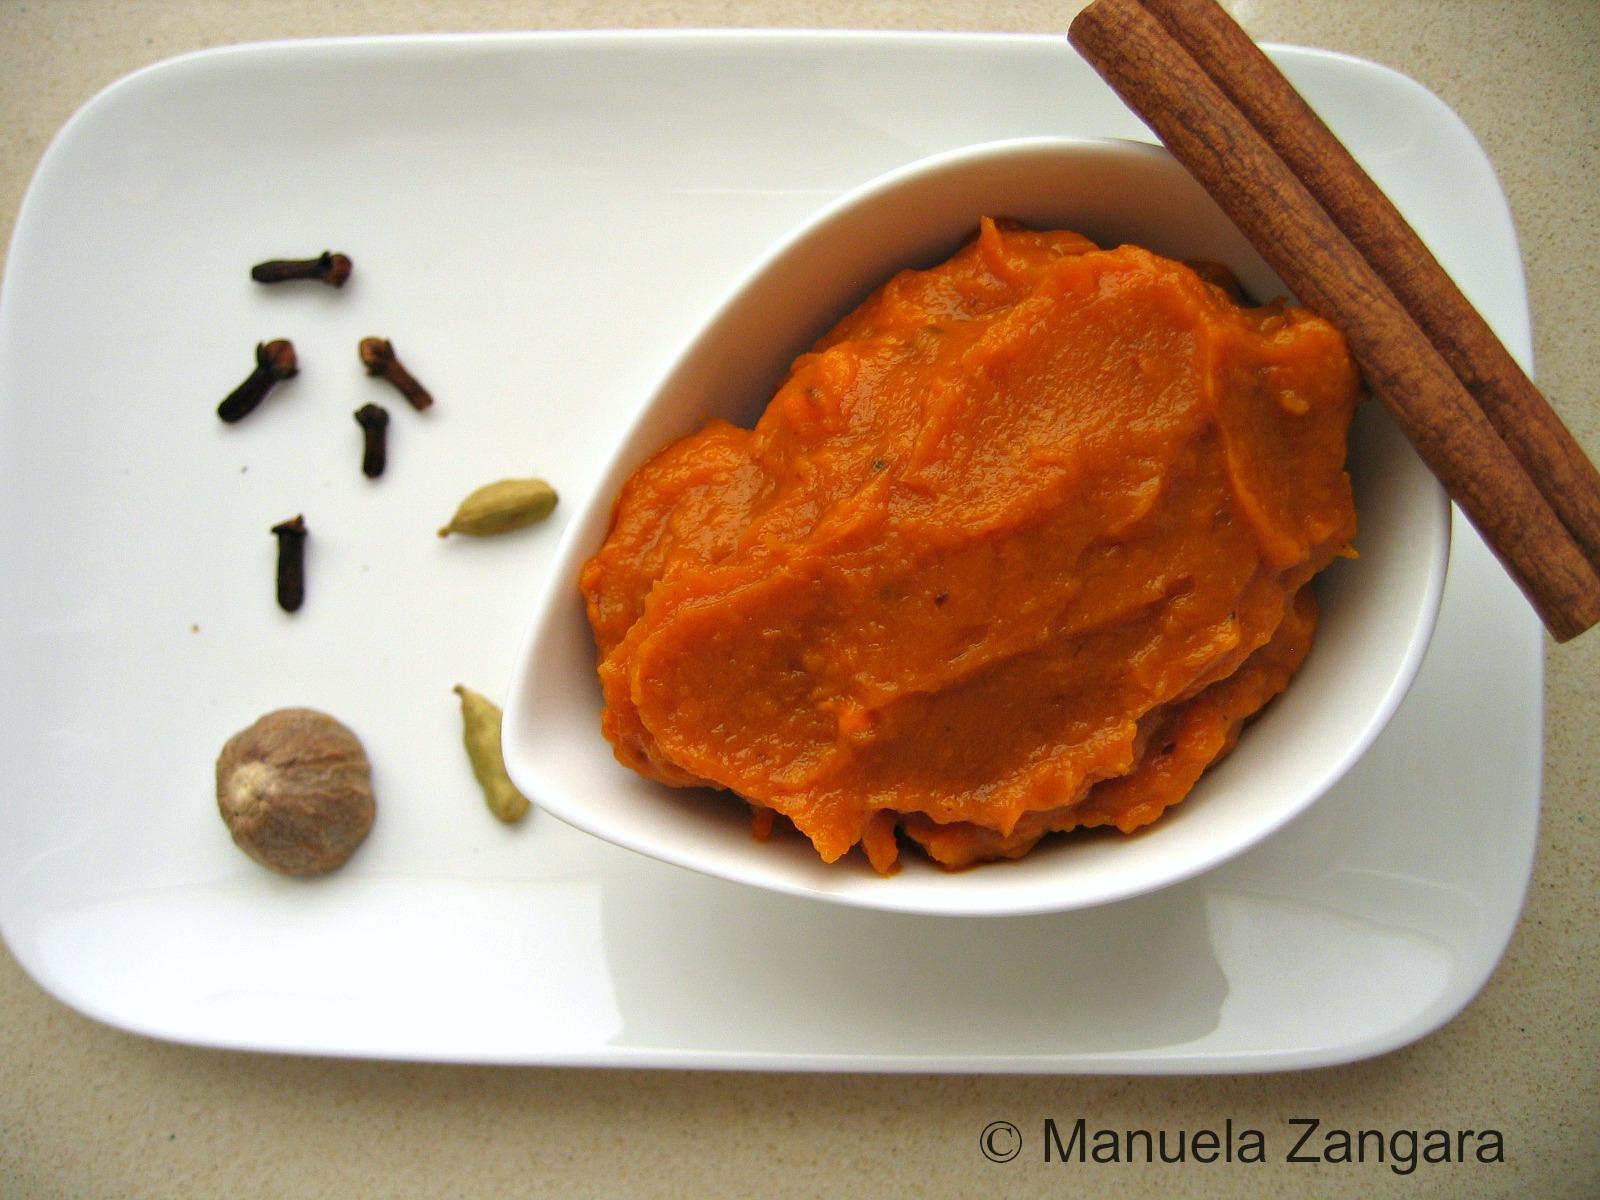 Home-made Pumpkin purée